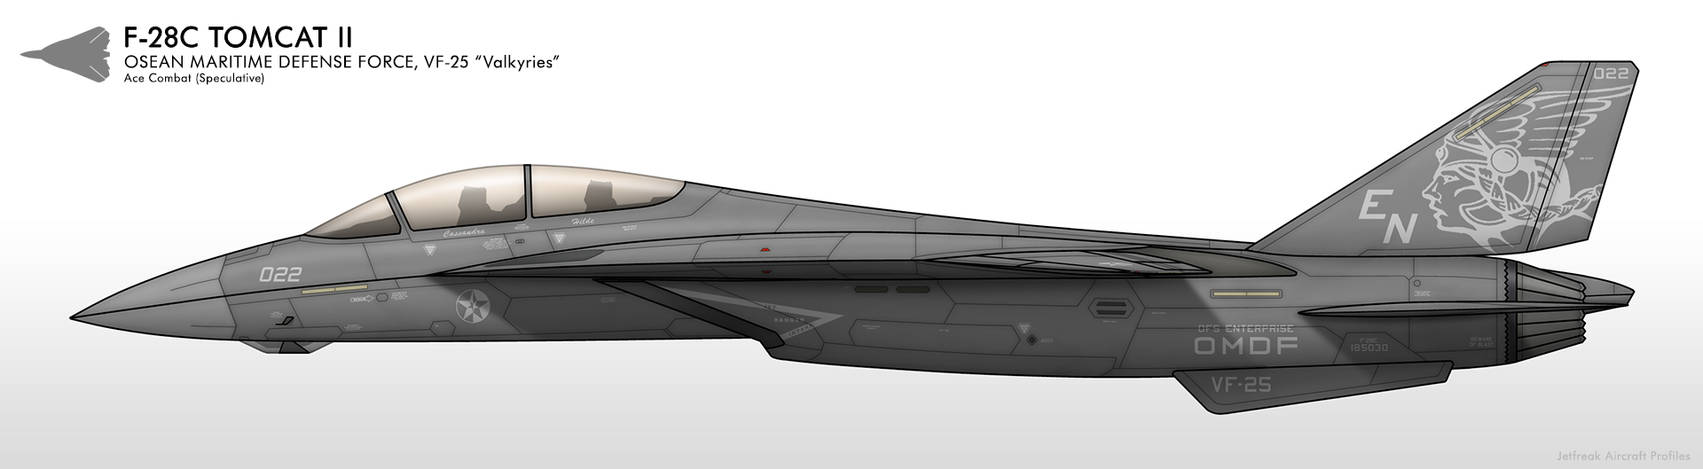 F-28C - VF-25 Valkyries